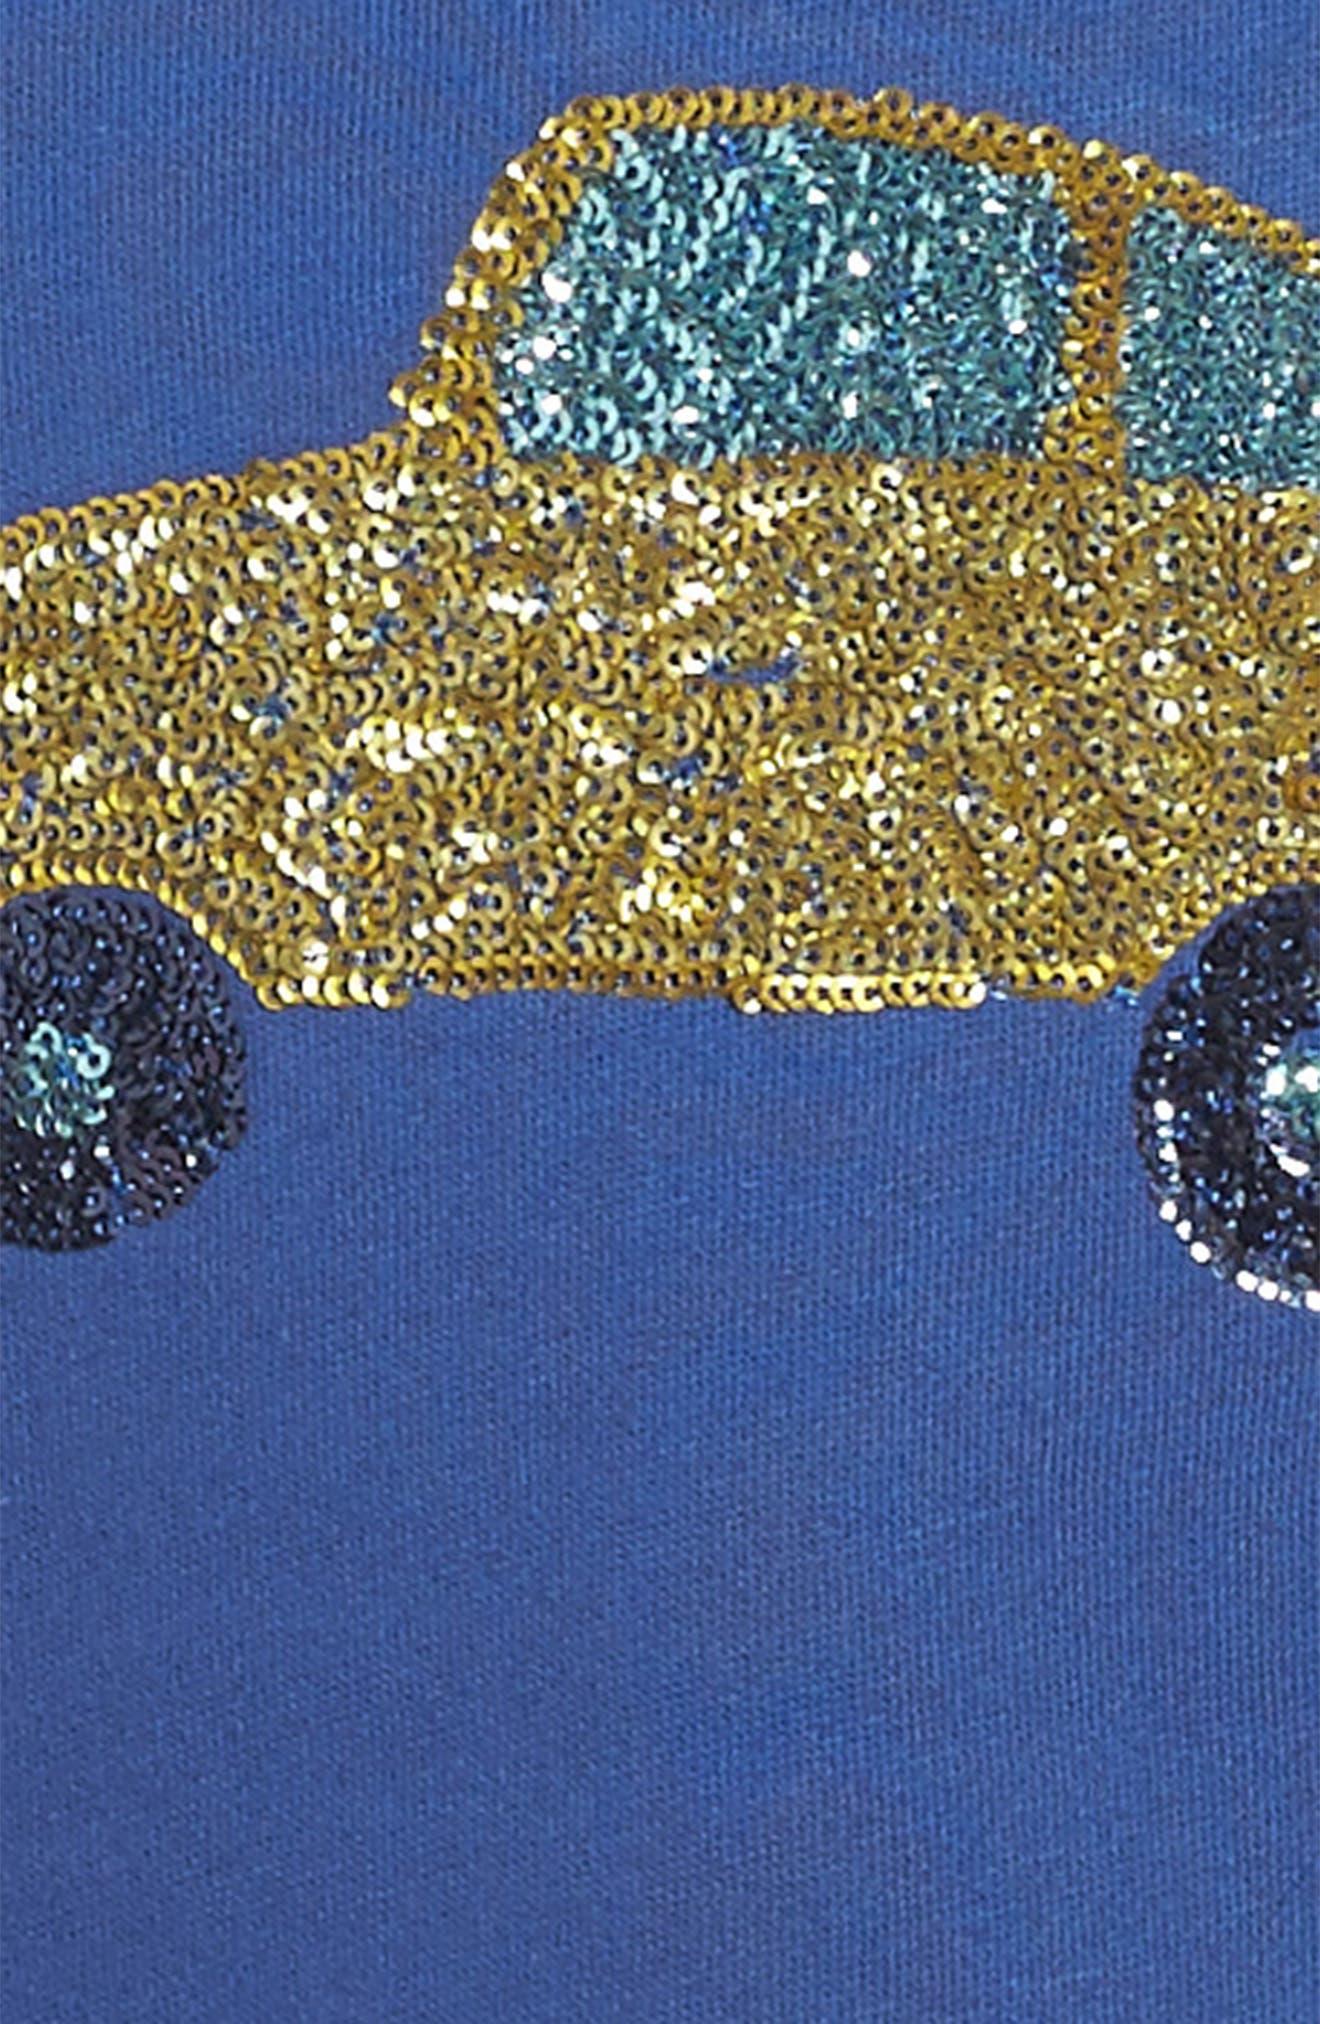 Sequin Appliqué Dress,                             Alternate thumbnail 3, color,                             Bluebell